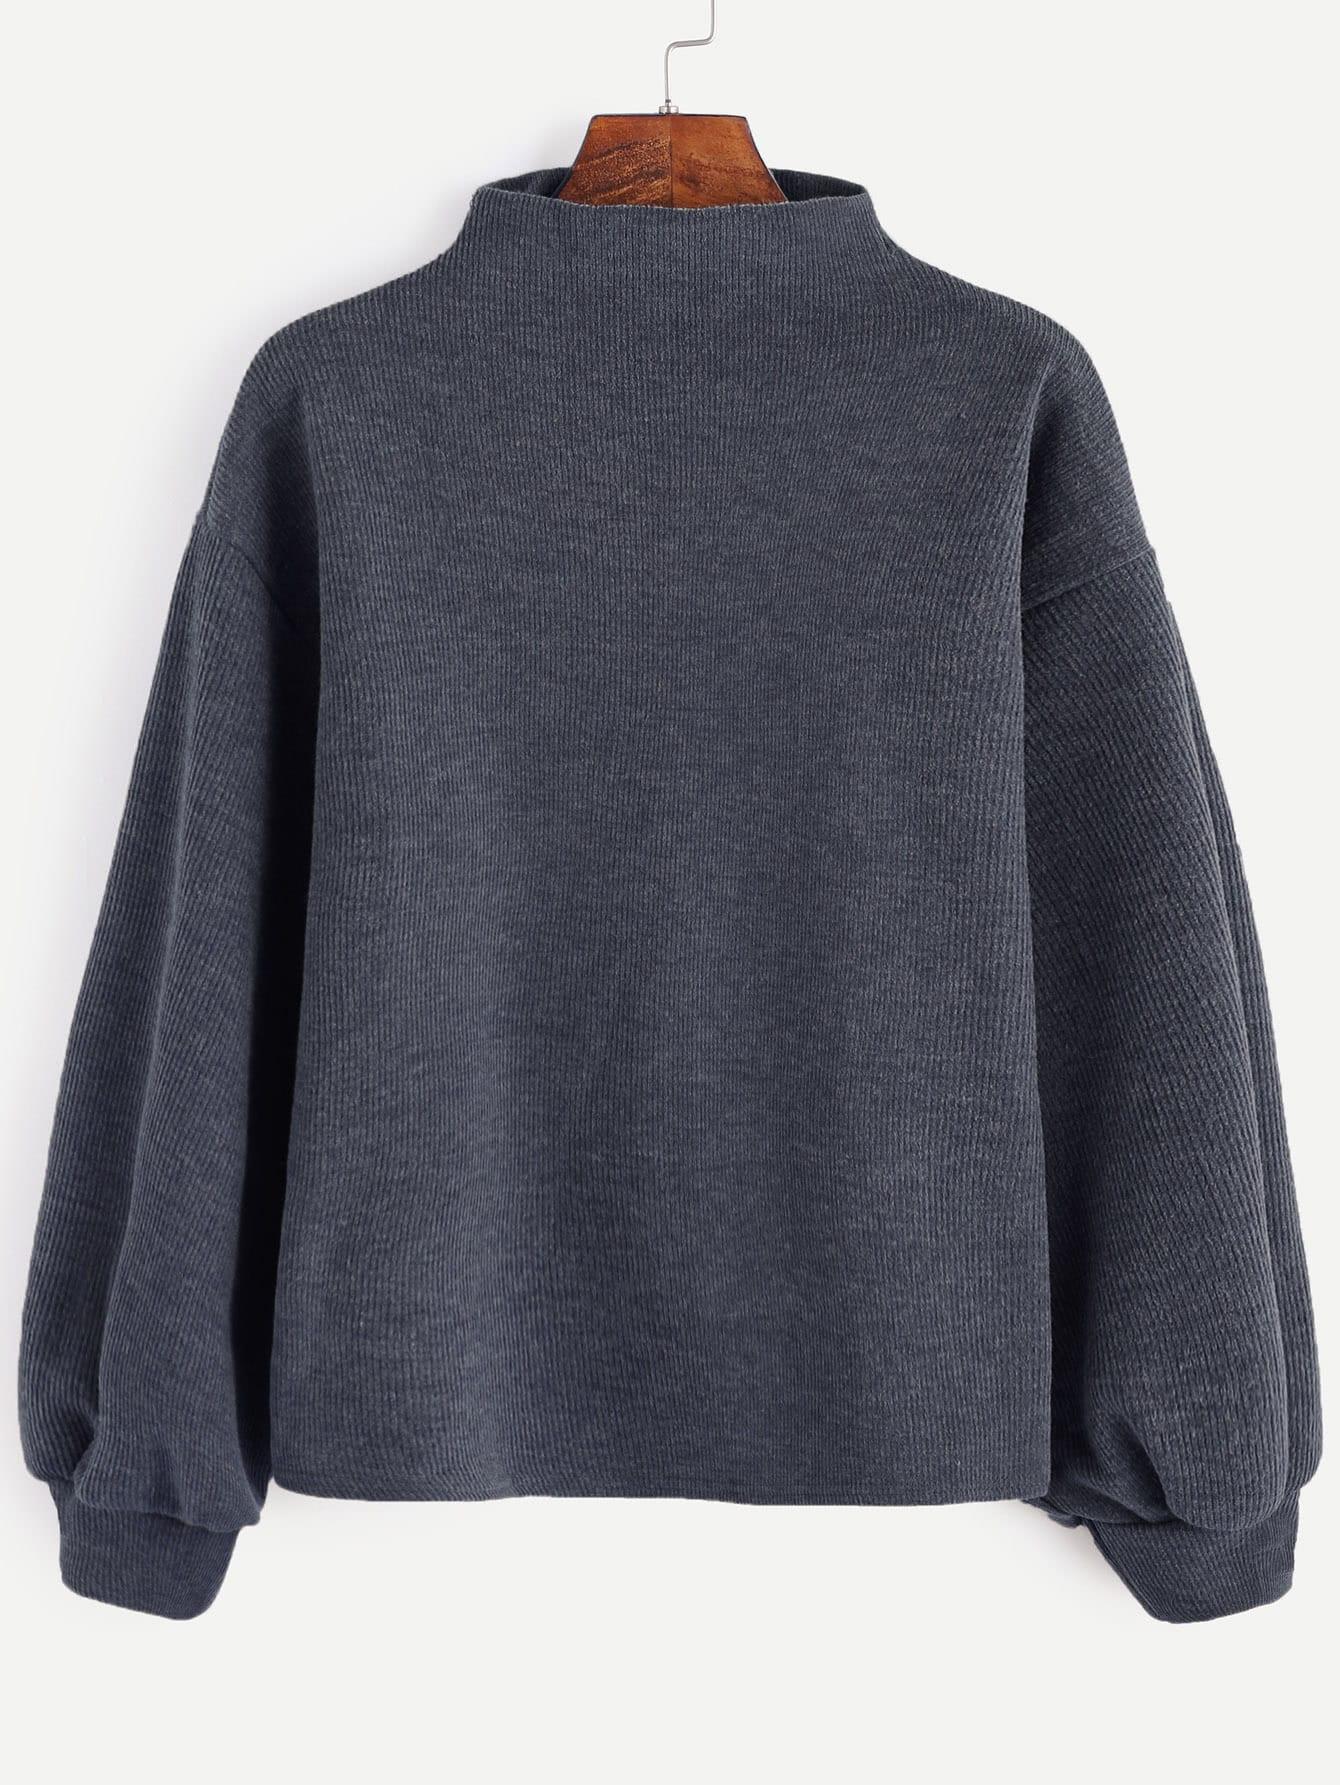 Dark Grey Ribbed Lantern Sleeve Sweater sweater161122006